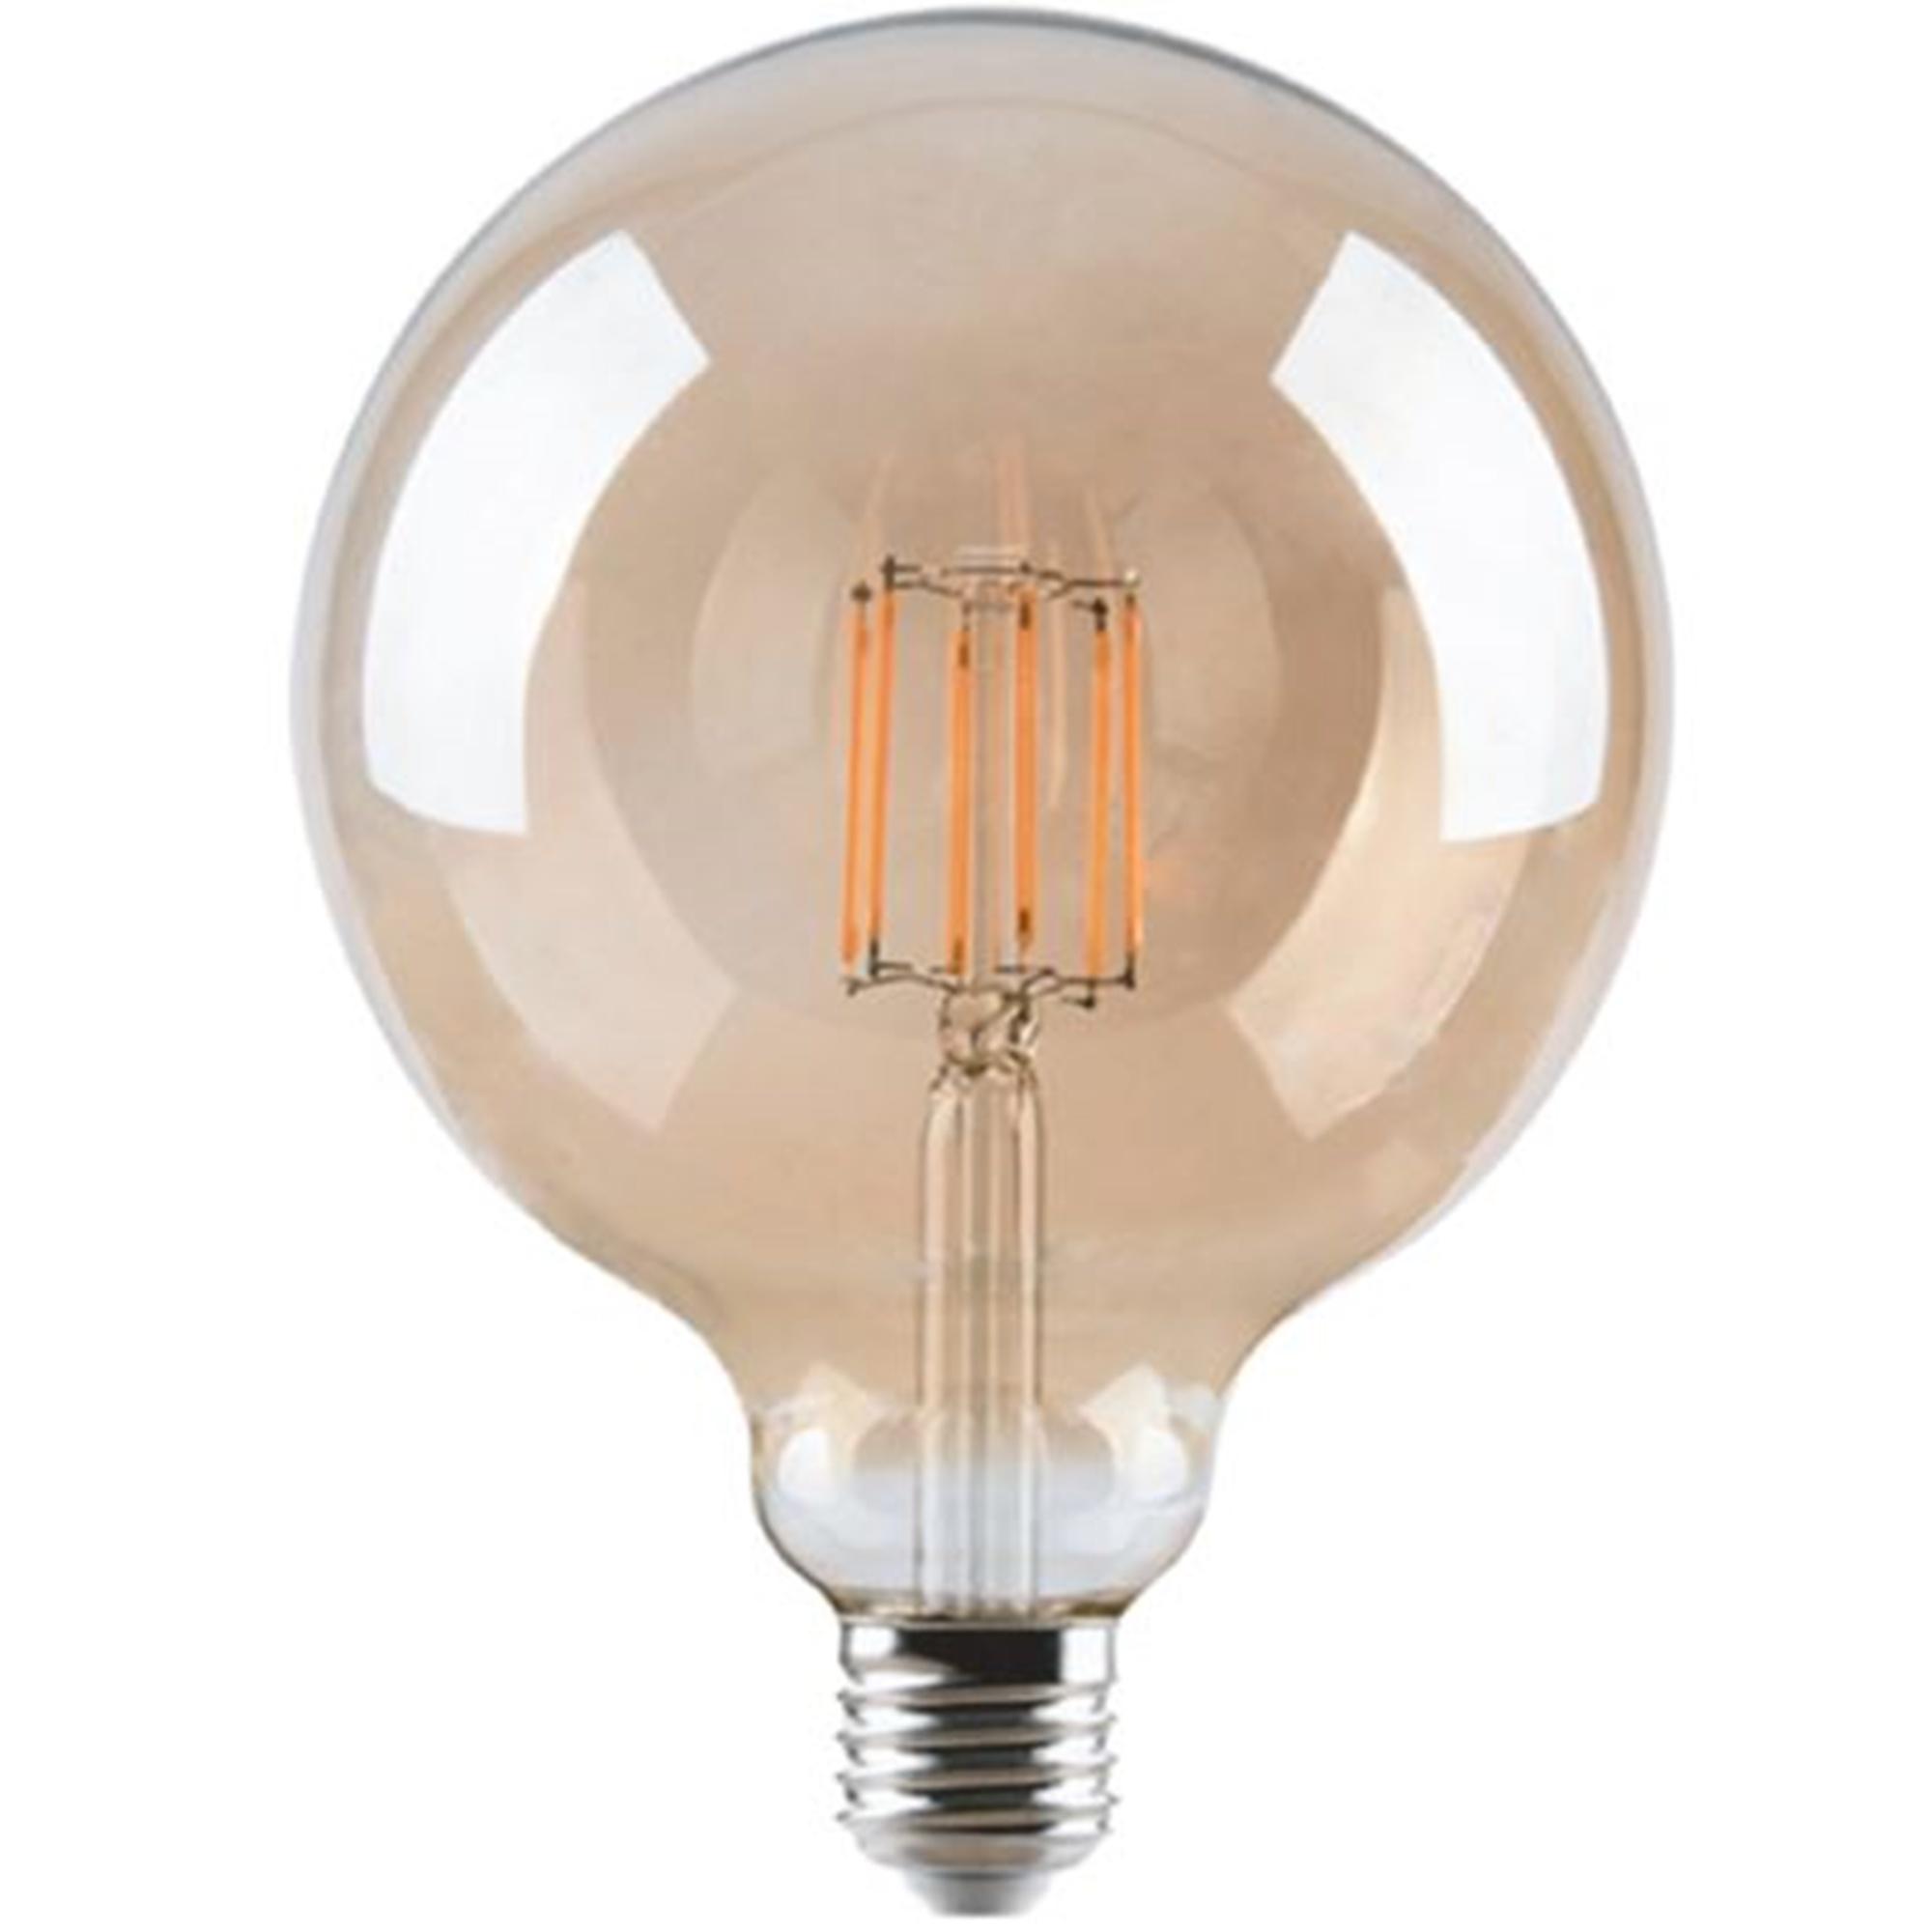 LED Lamp Retro Filament Bol - Warm Wit - G125 -  4W - E27 - Dimbaar